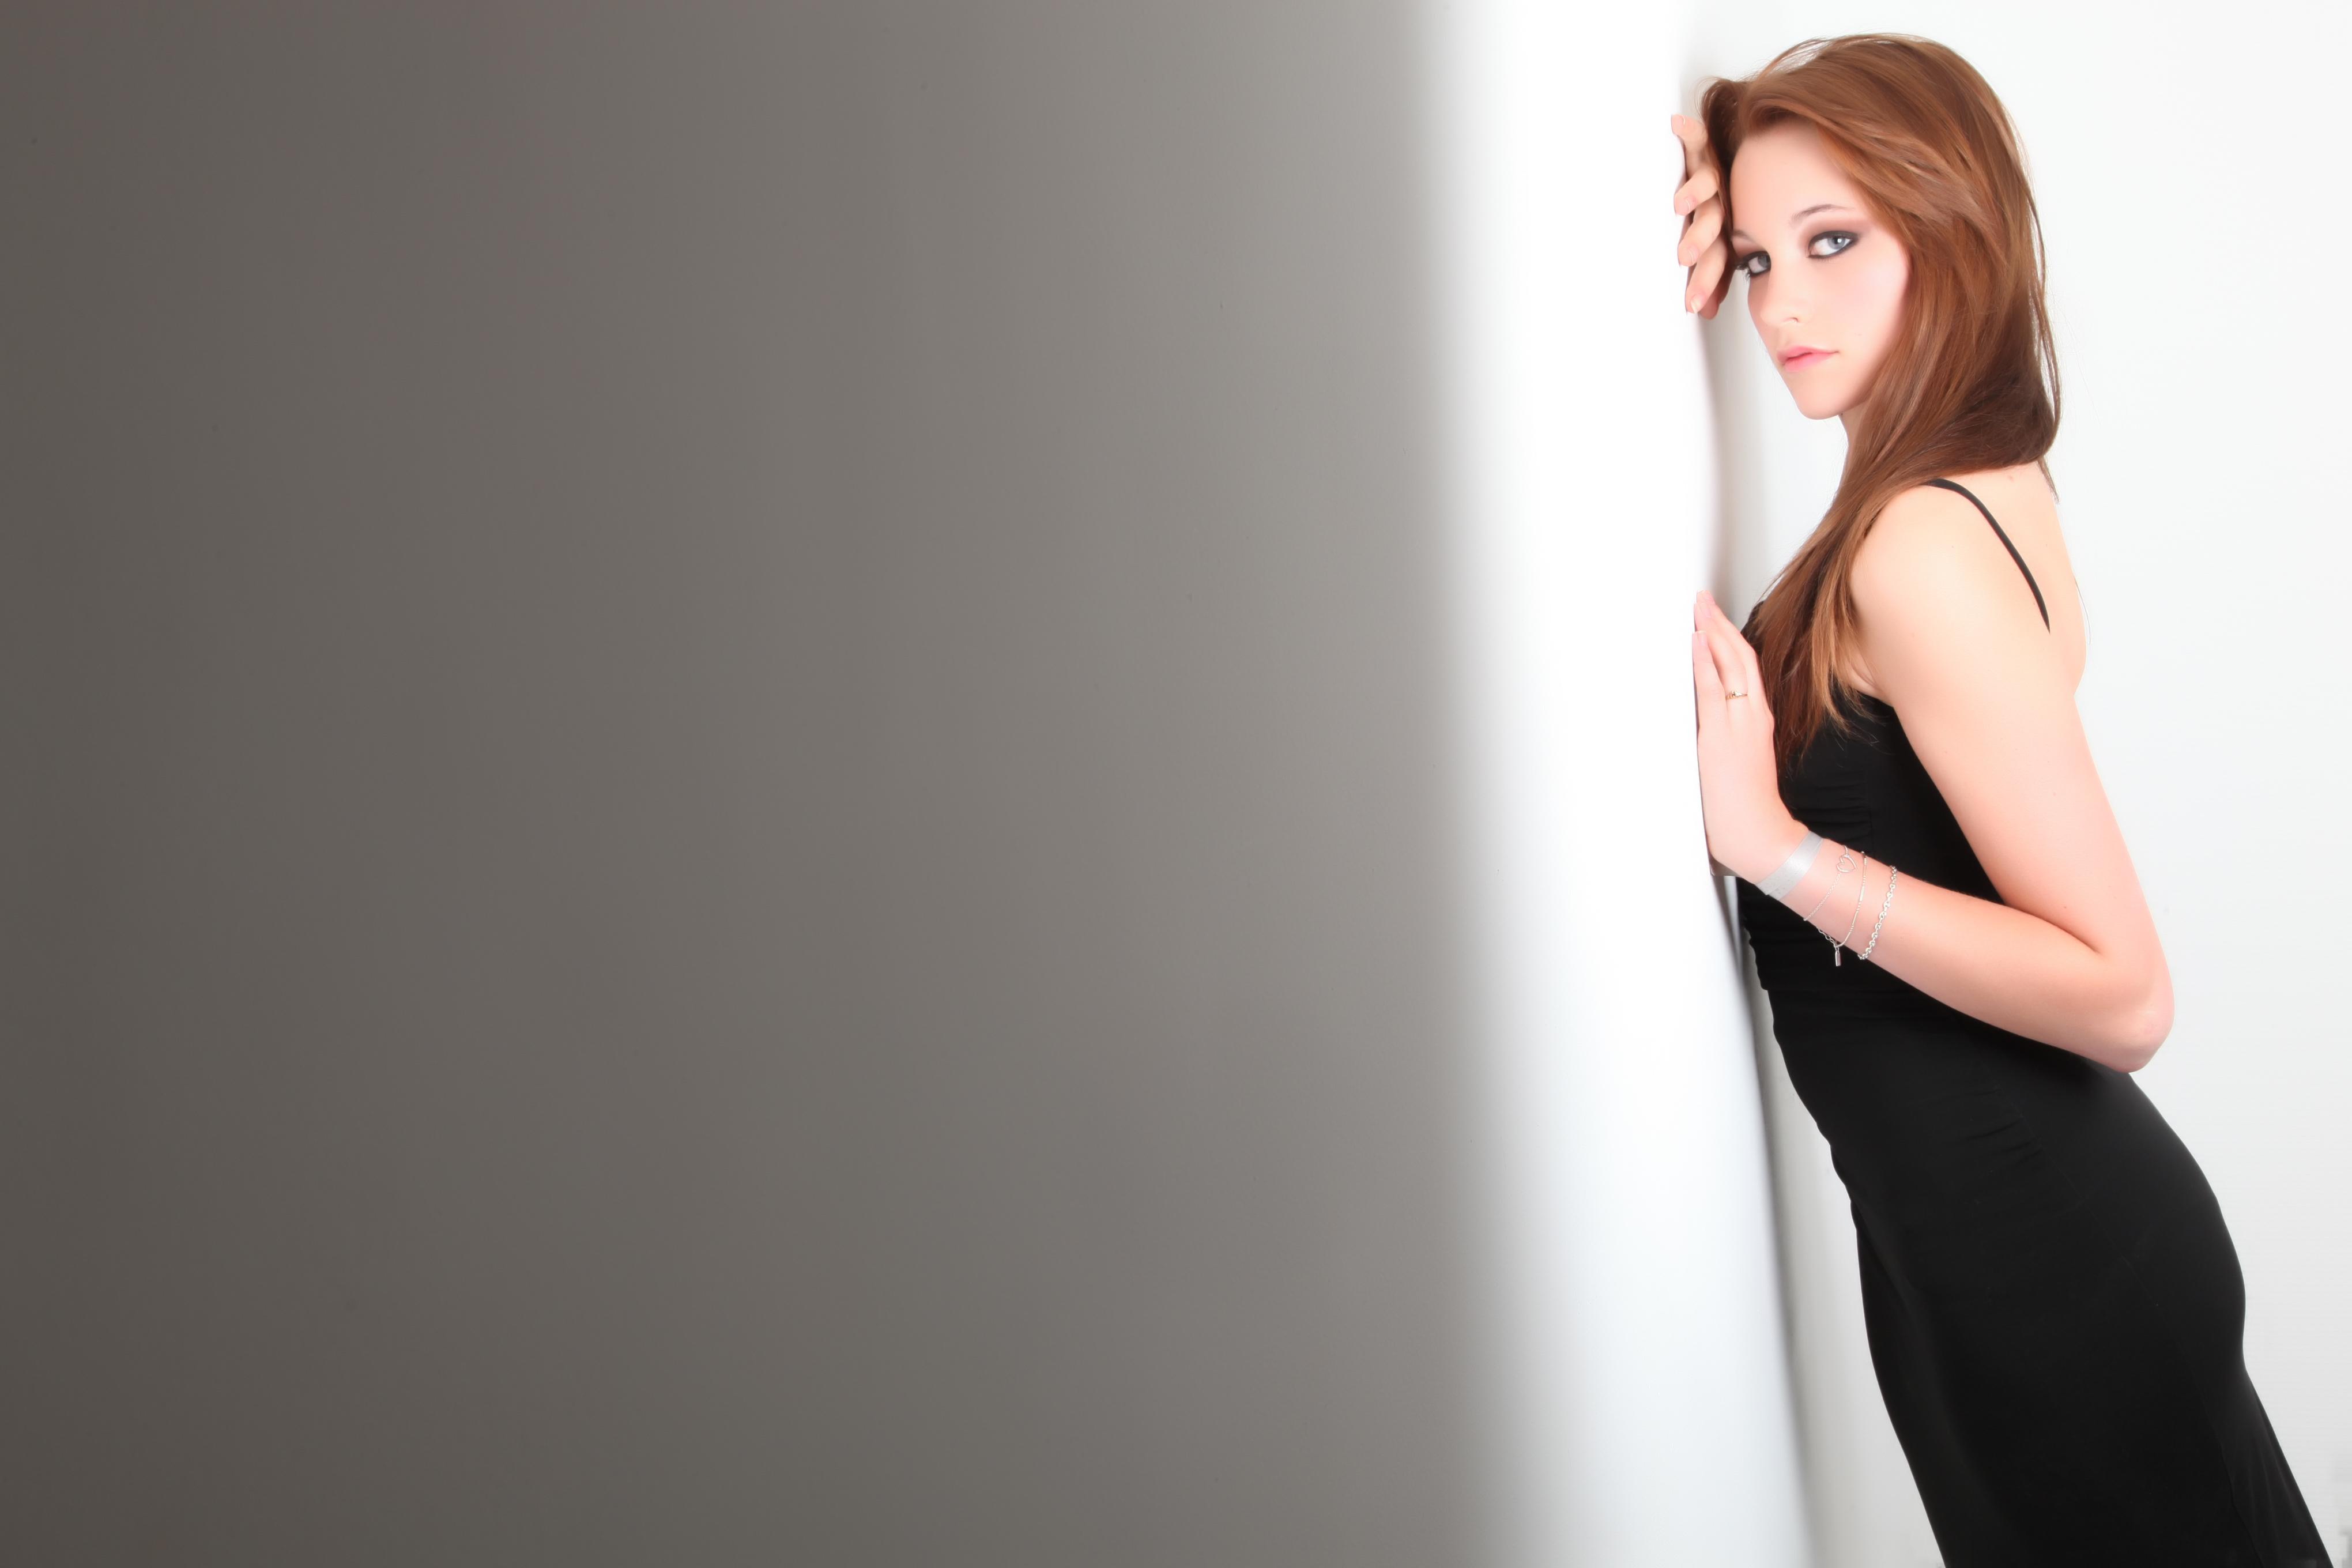 Galerie photo femme